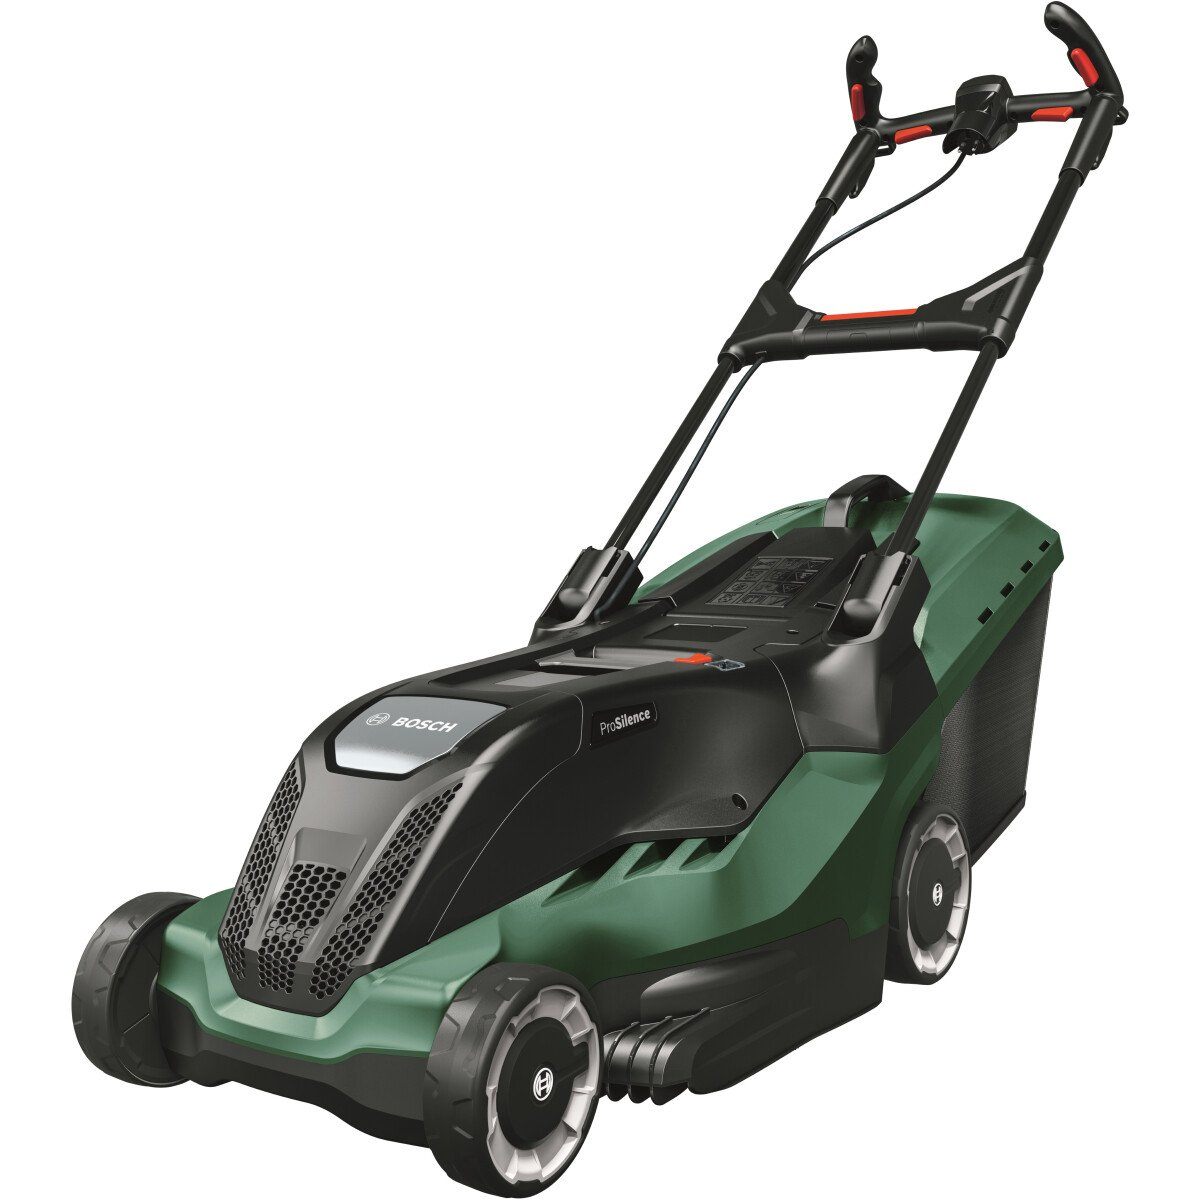 Bosch AdvancedRotak 650 1700W 41cm Lawn Mower